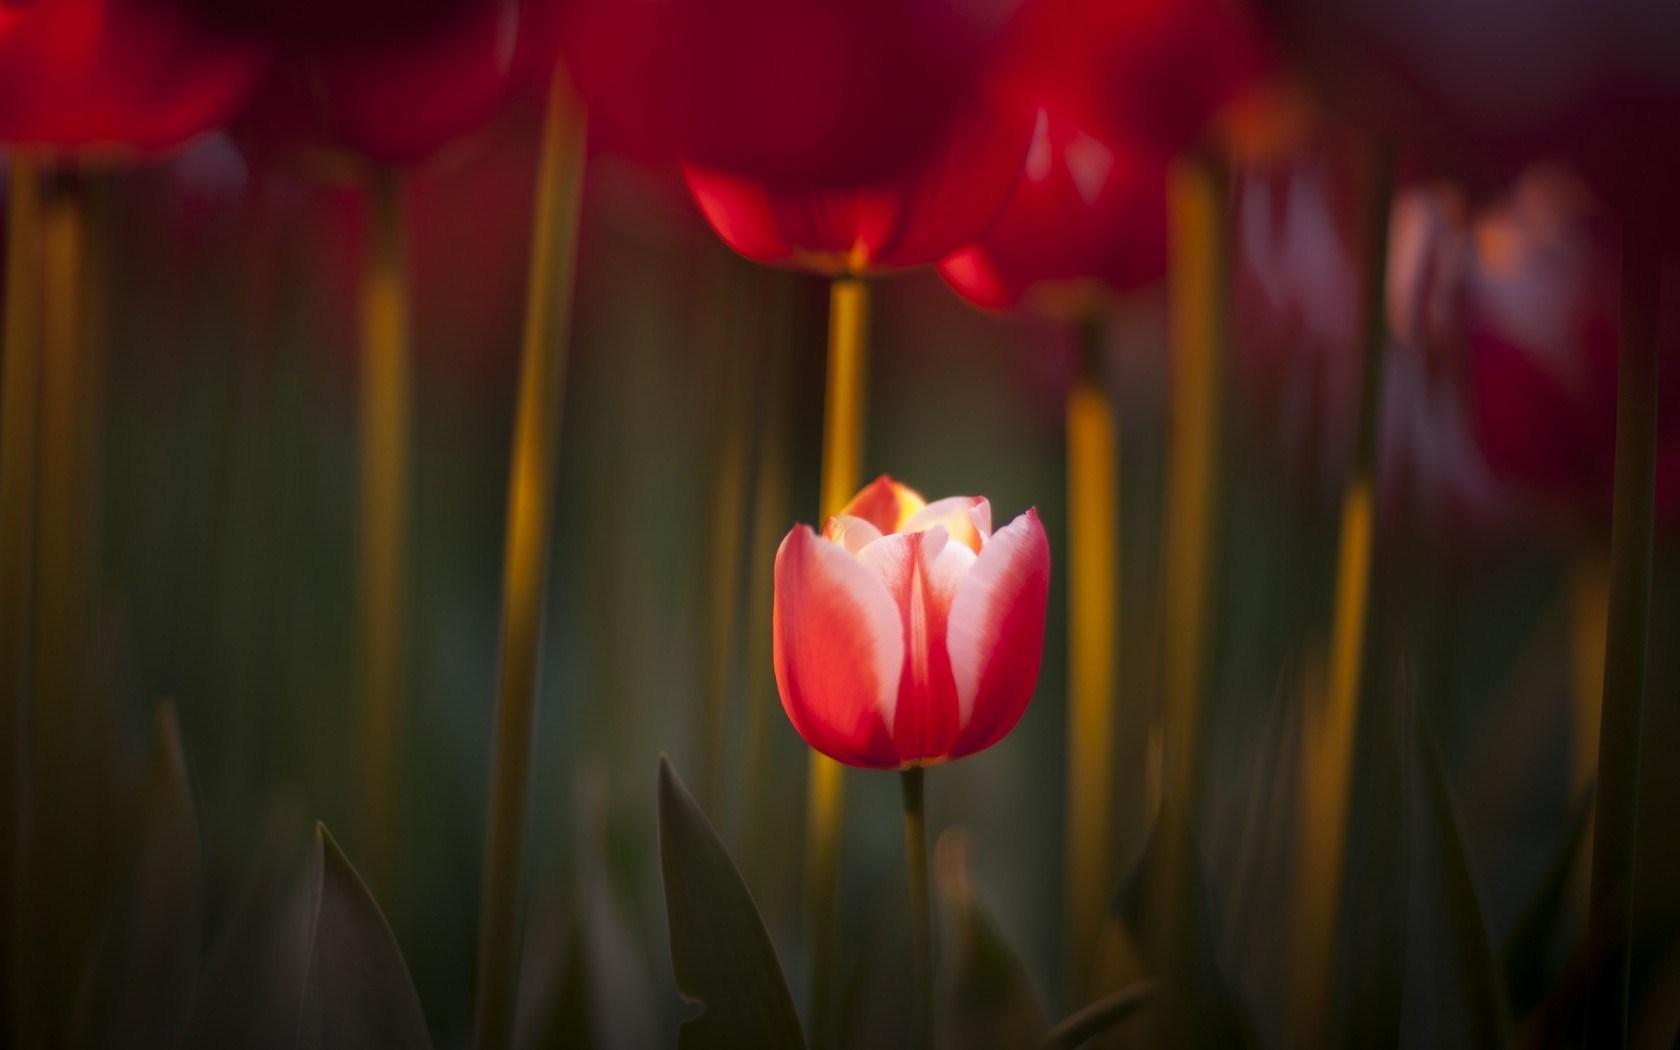 focus tulips red spring nature